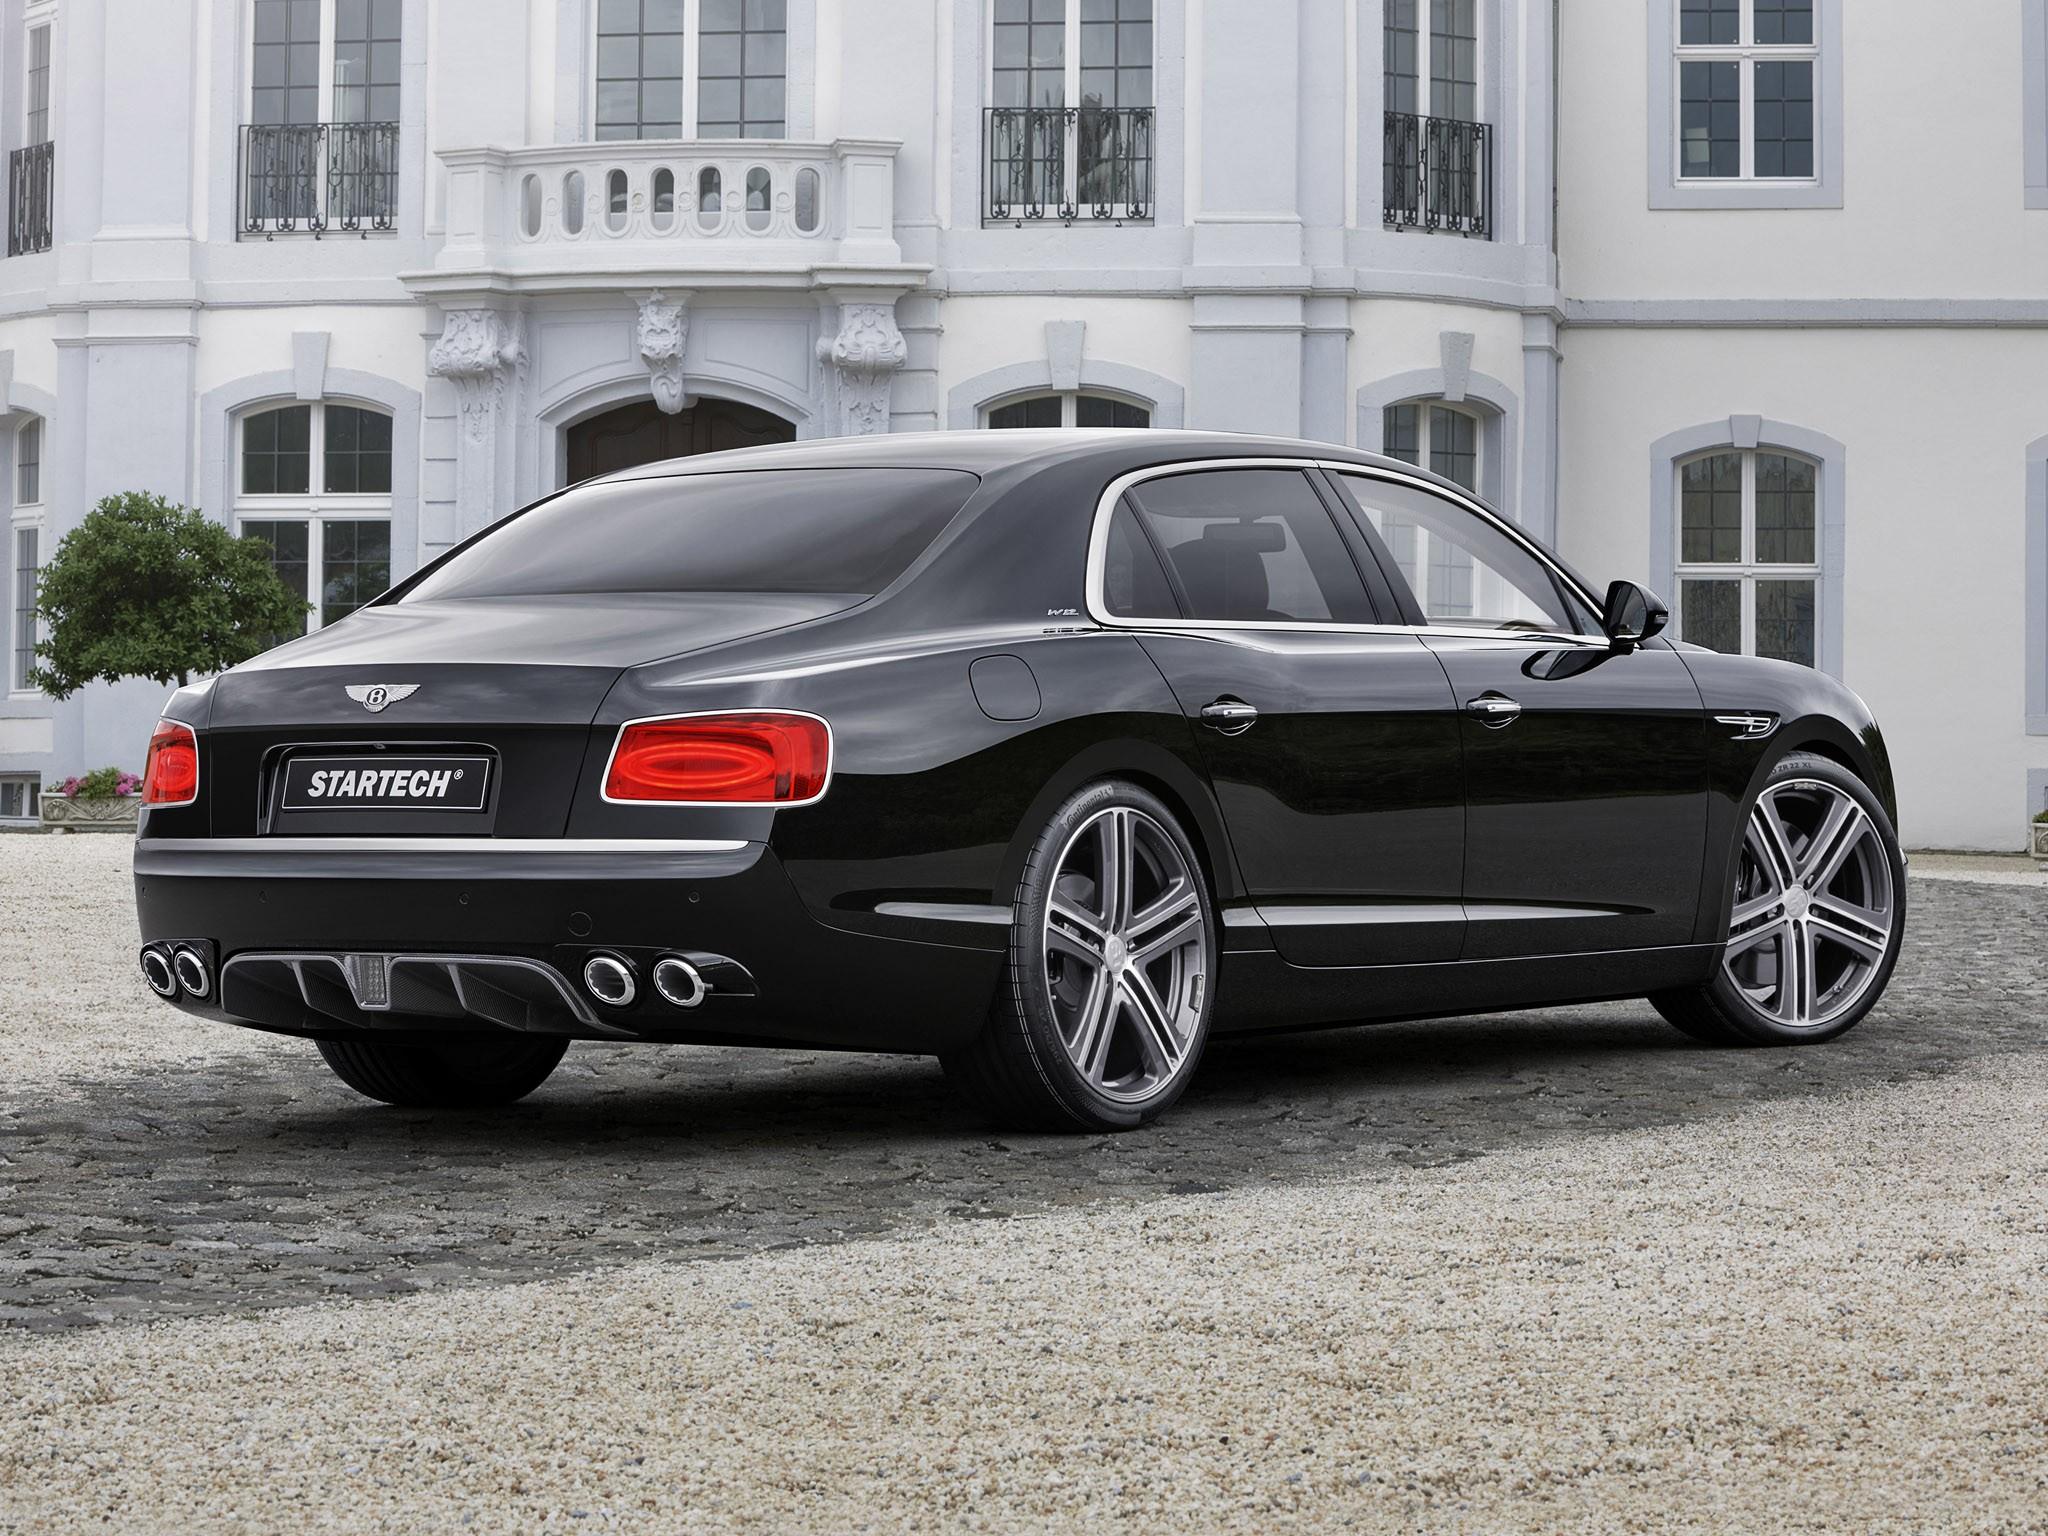 2015 Startech Bentley Continental Flying Spur